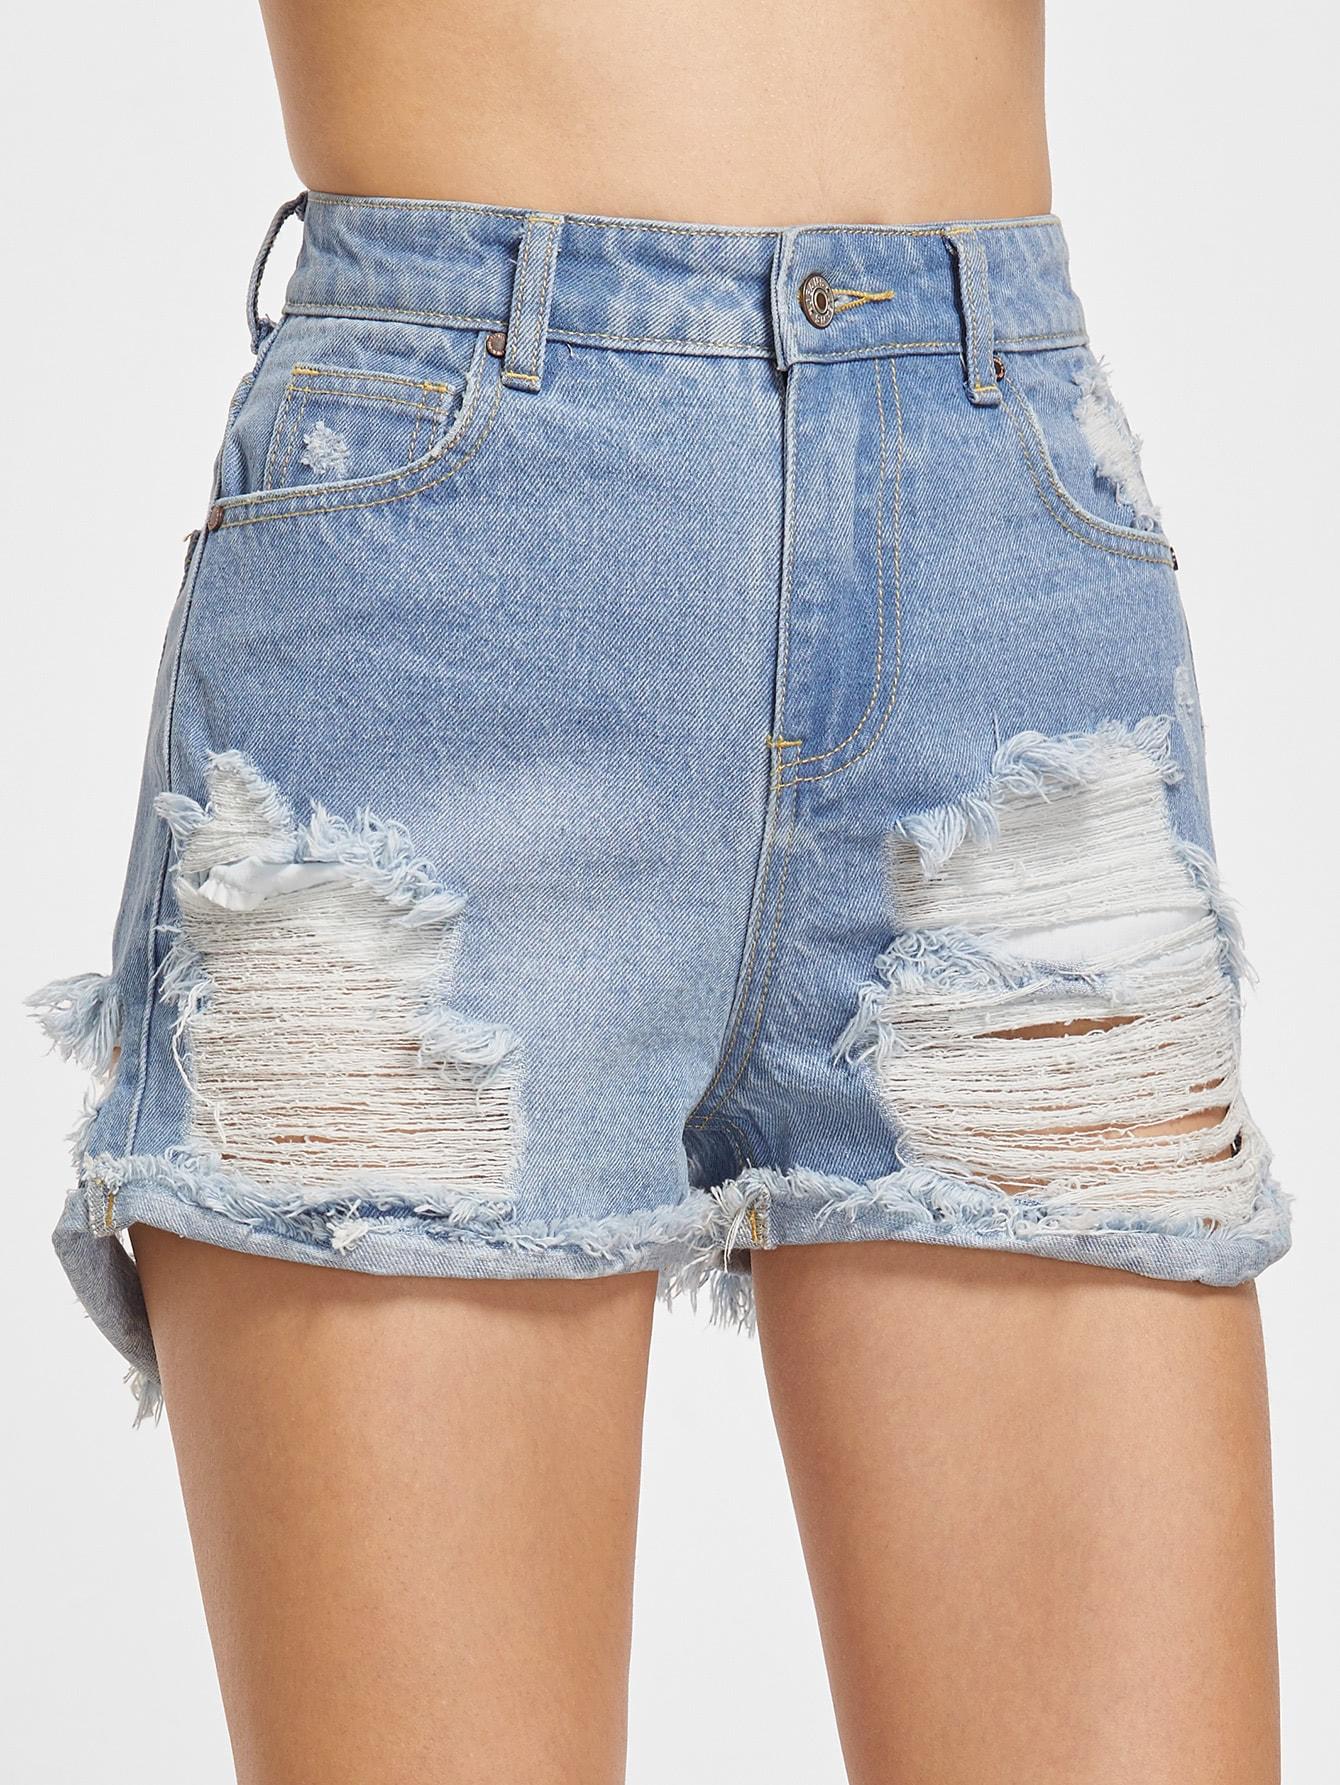 shorts161202452_2